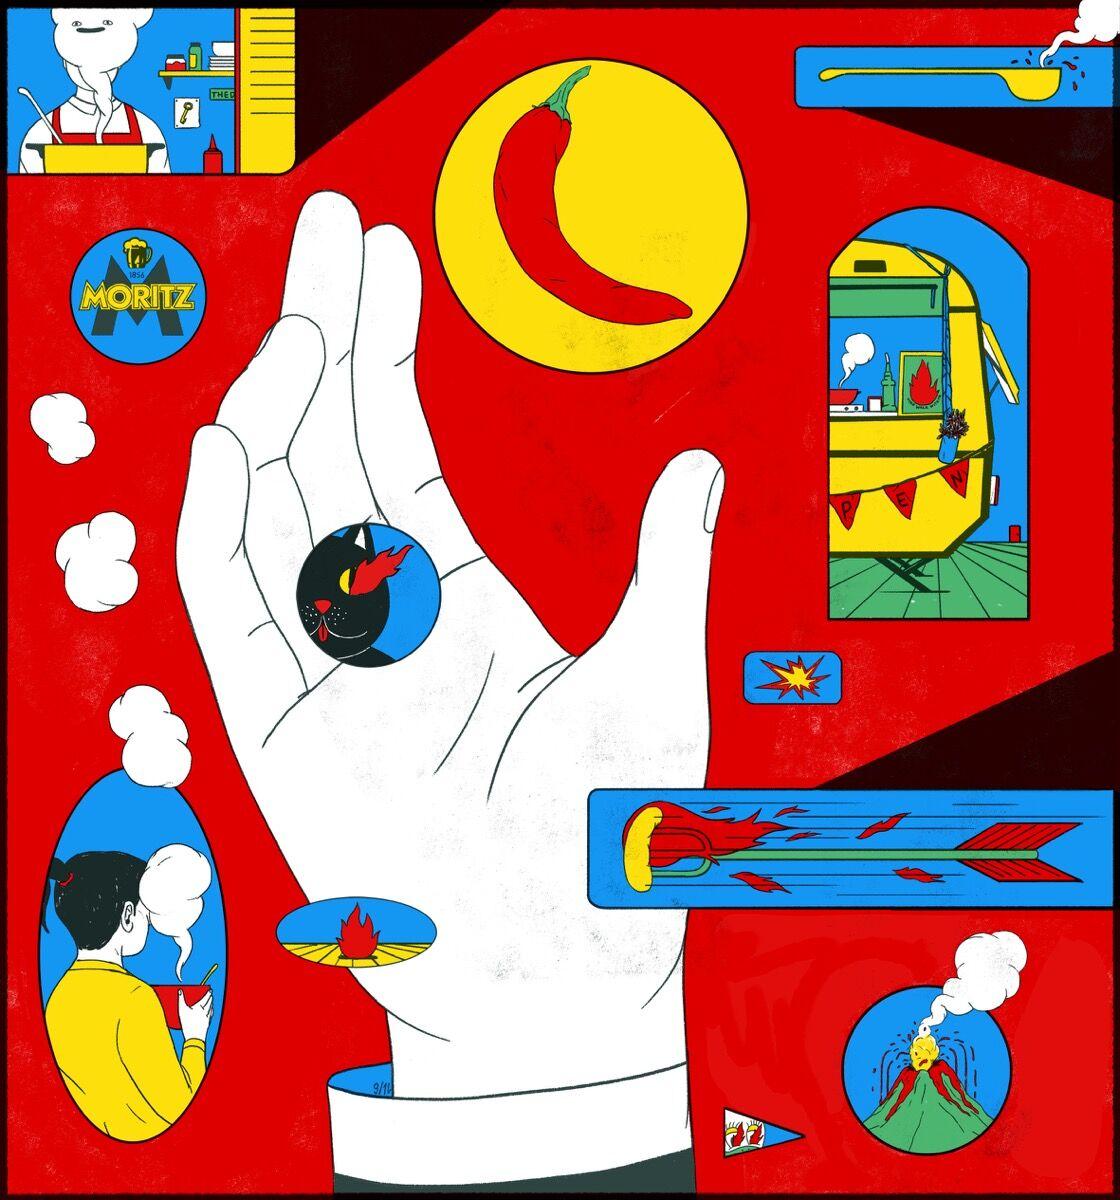 Cristina Daura, Illustration for Eat Street. Courtesy of the artist.